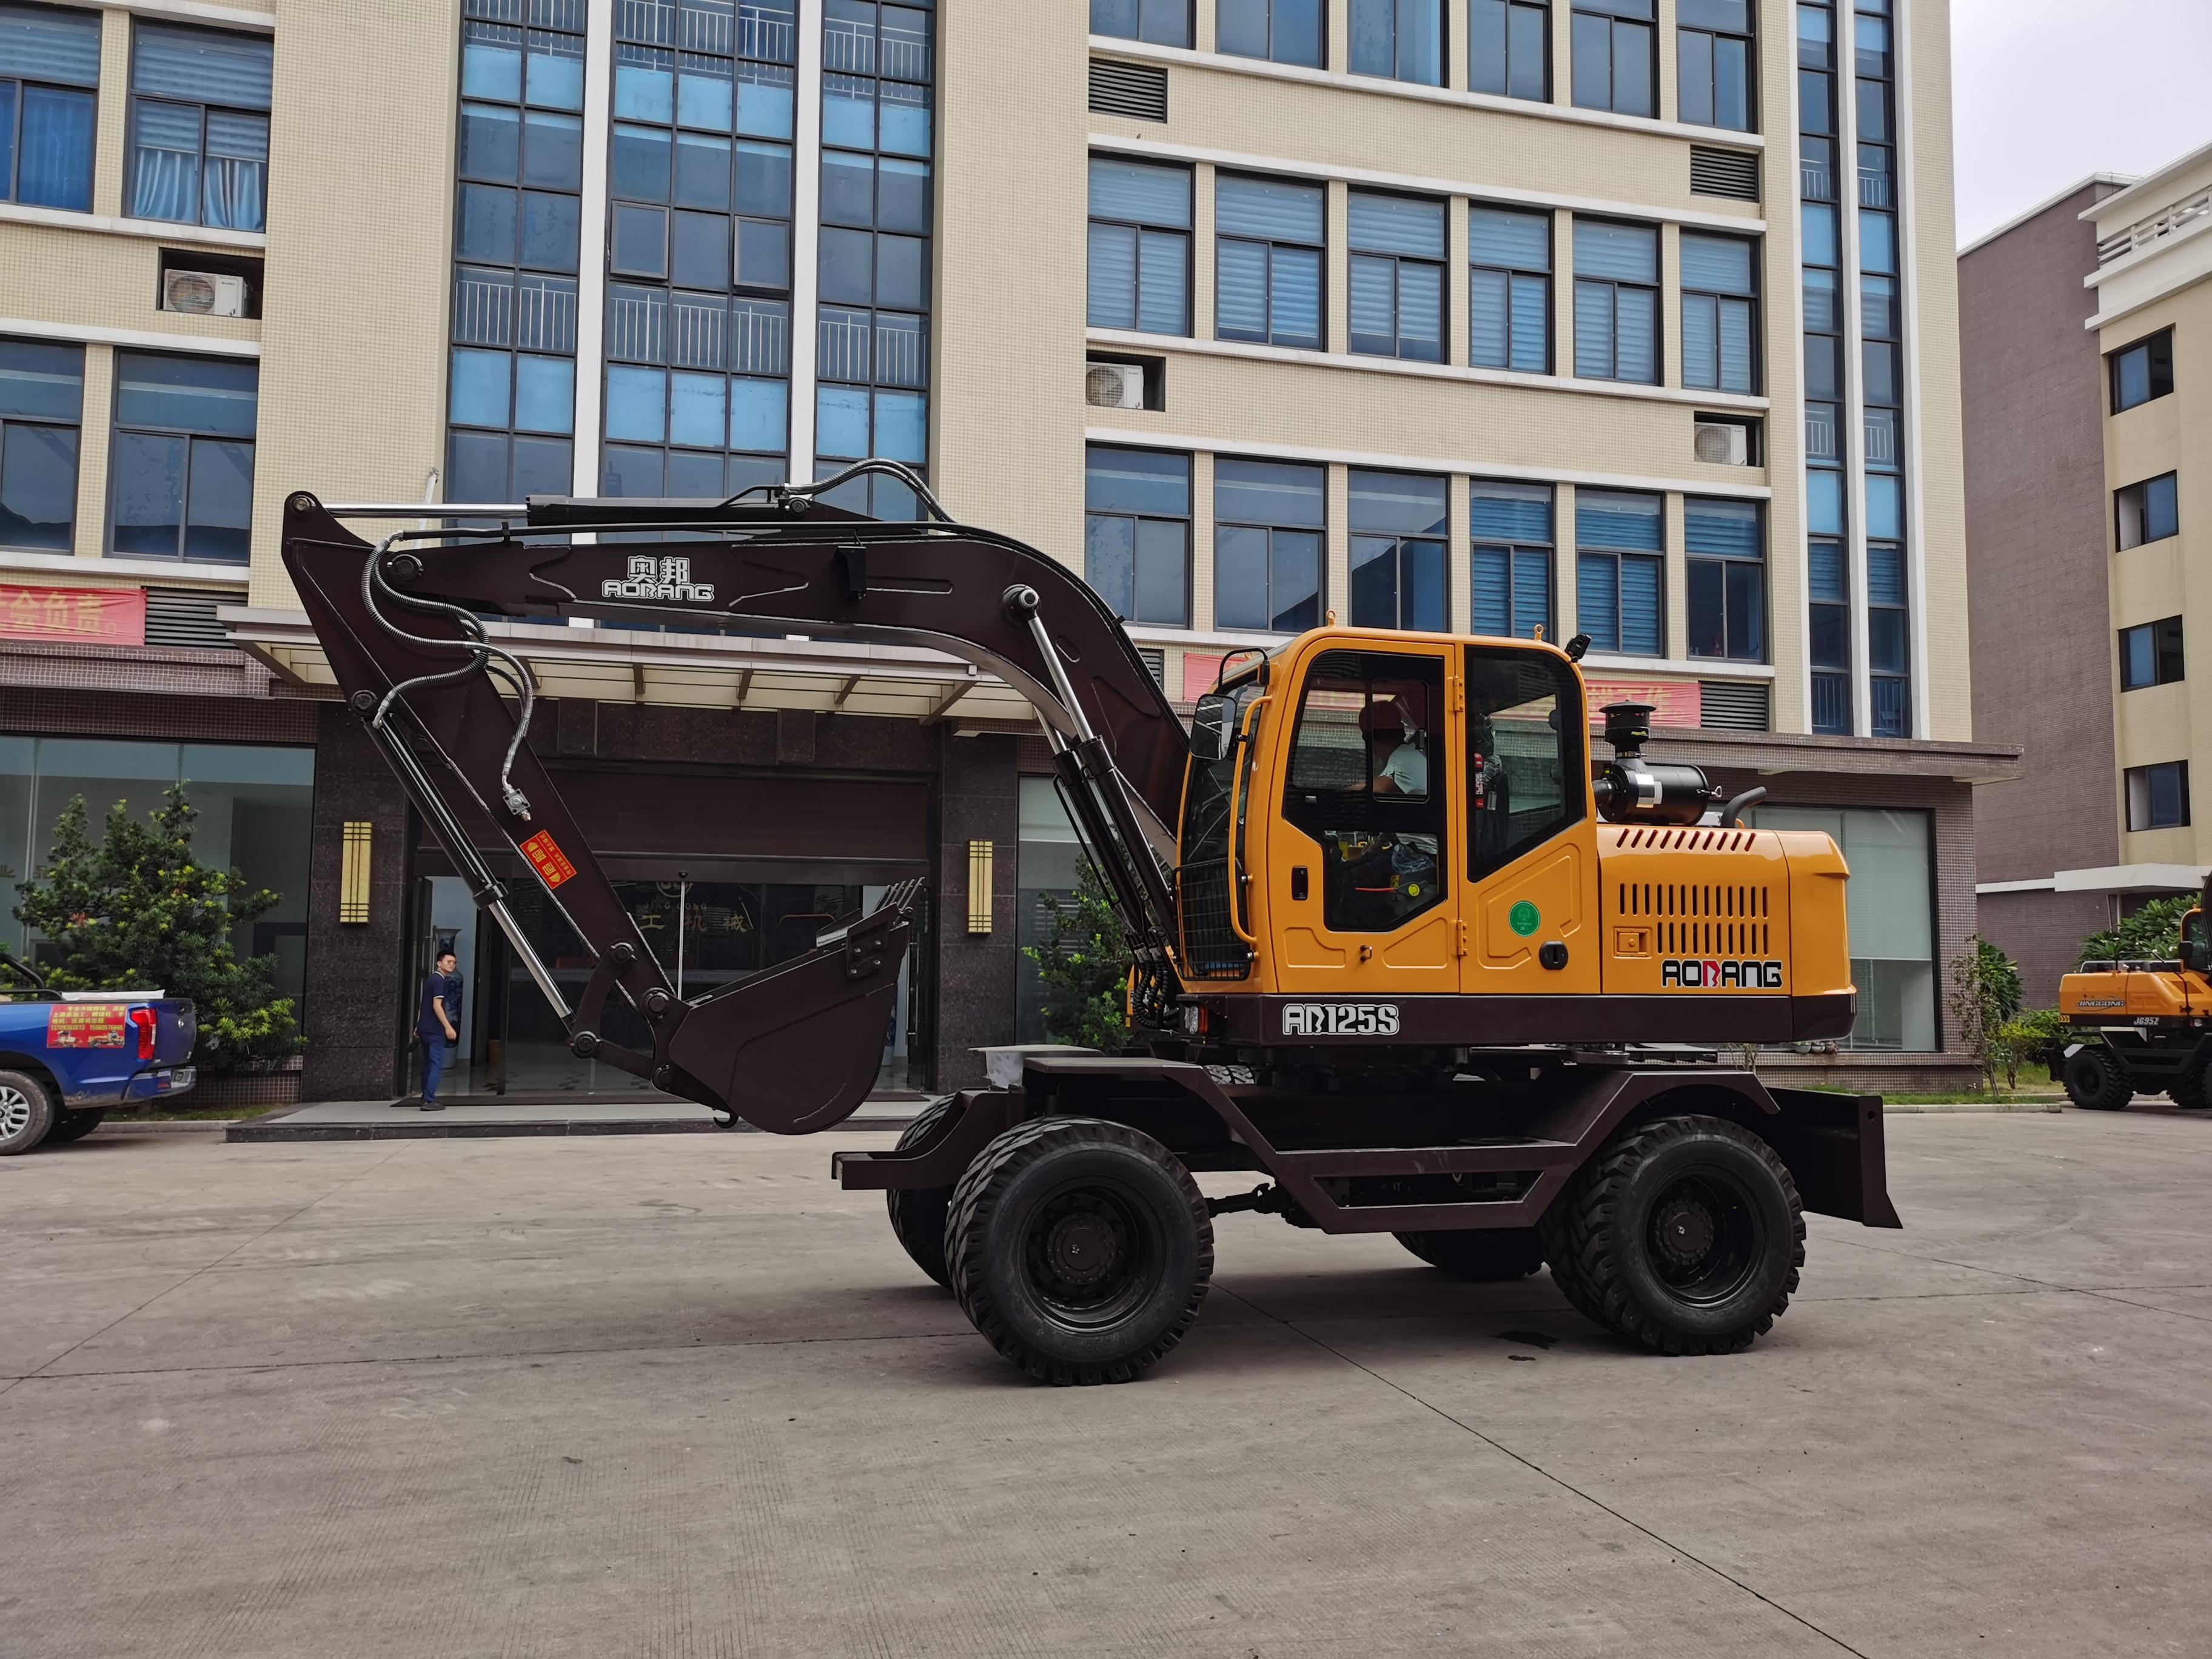 JG125S Wheel Excavator with Wheel Side Deceleration